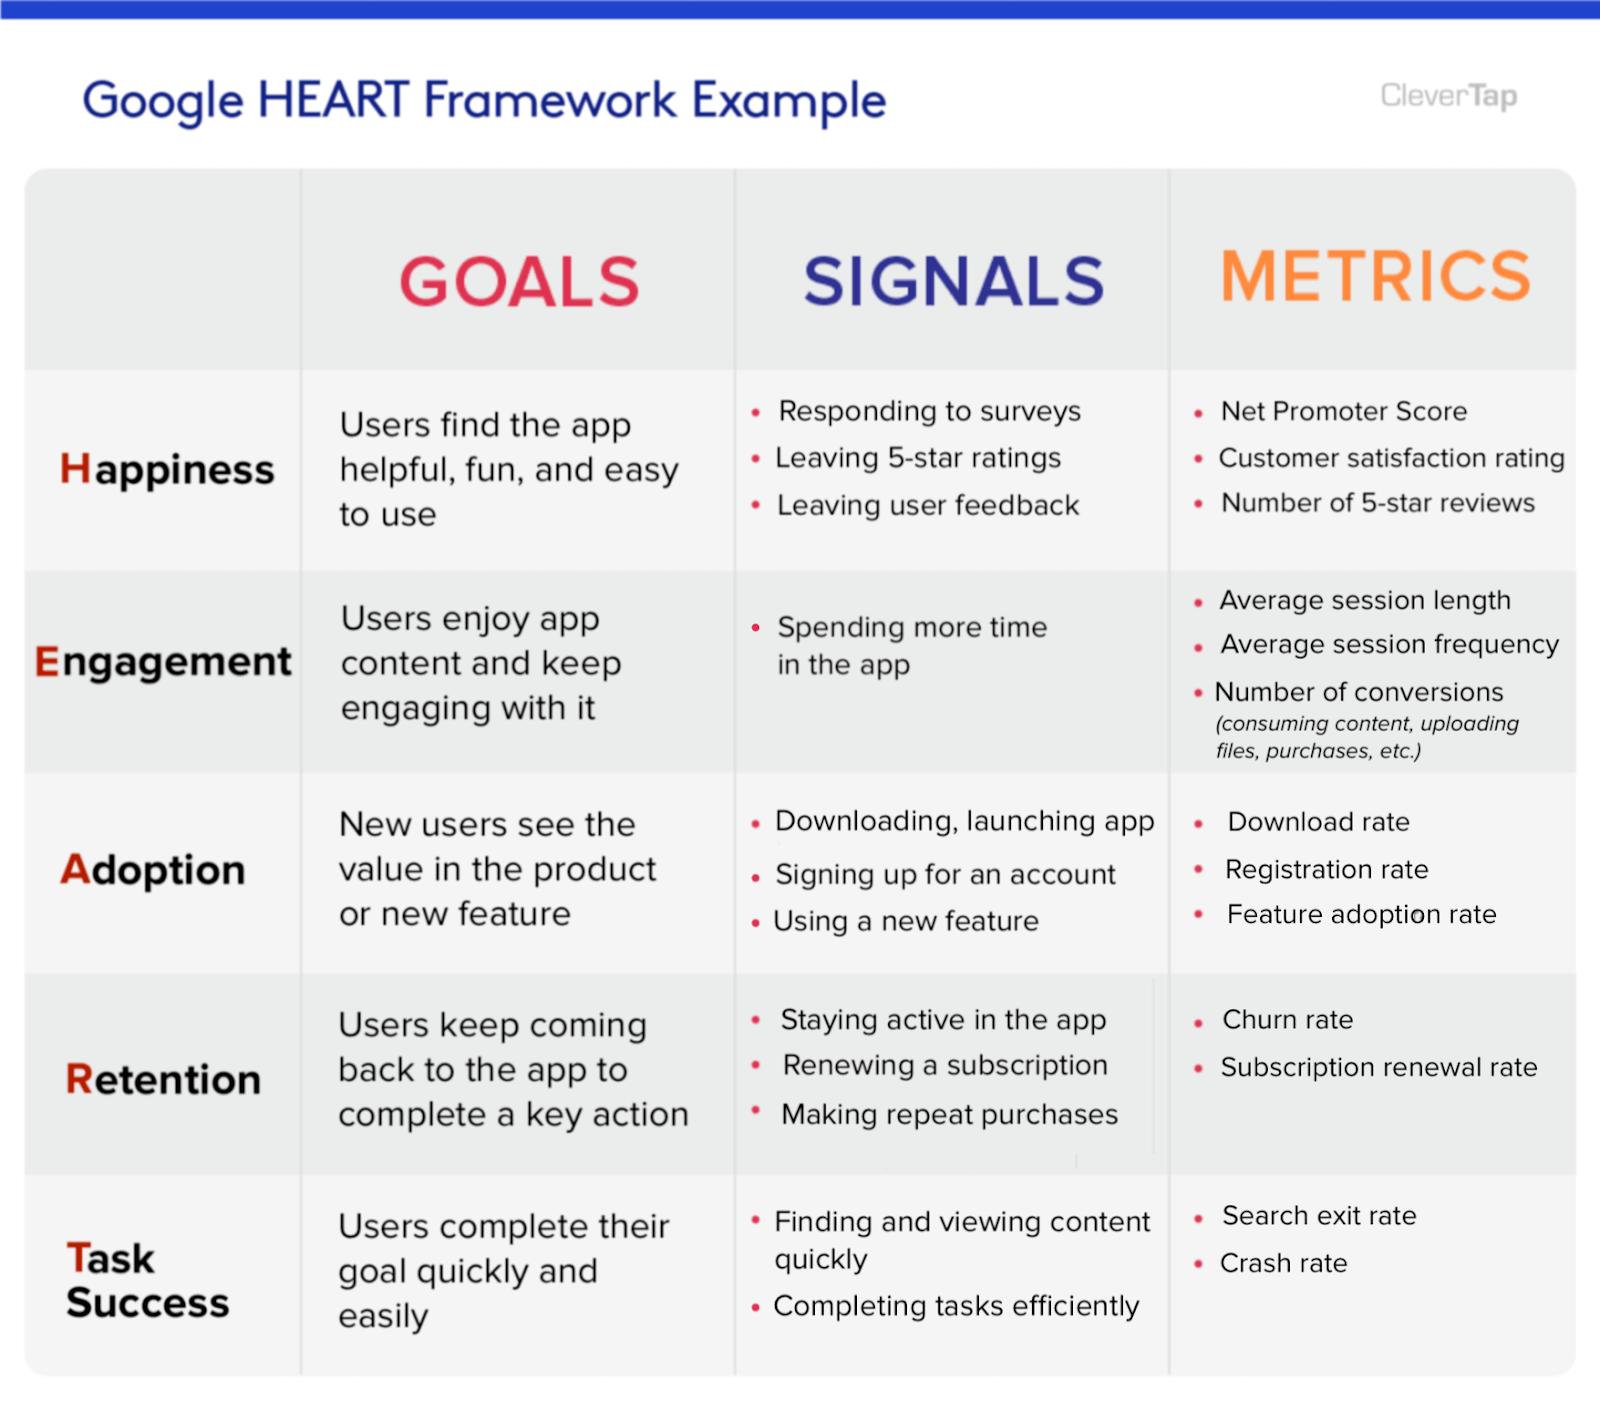 google HEART framework example